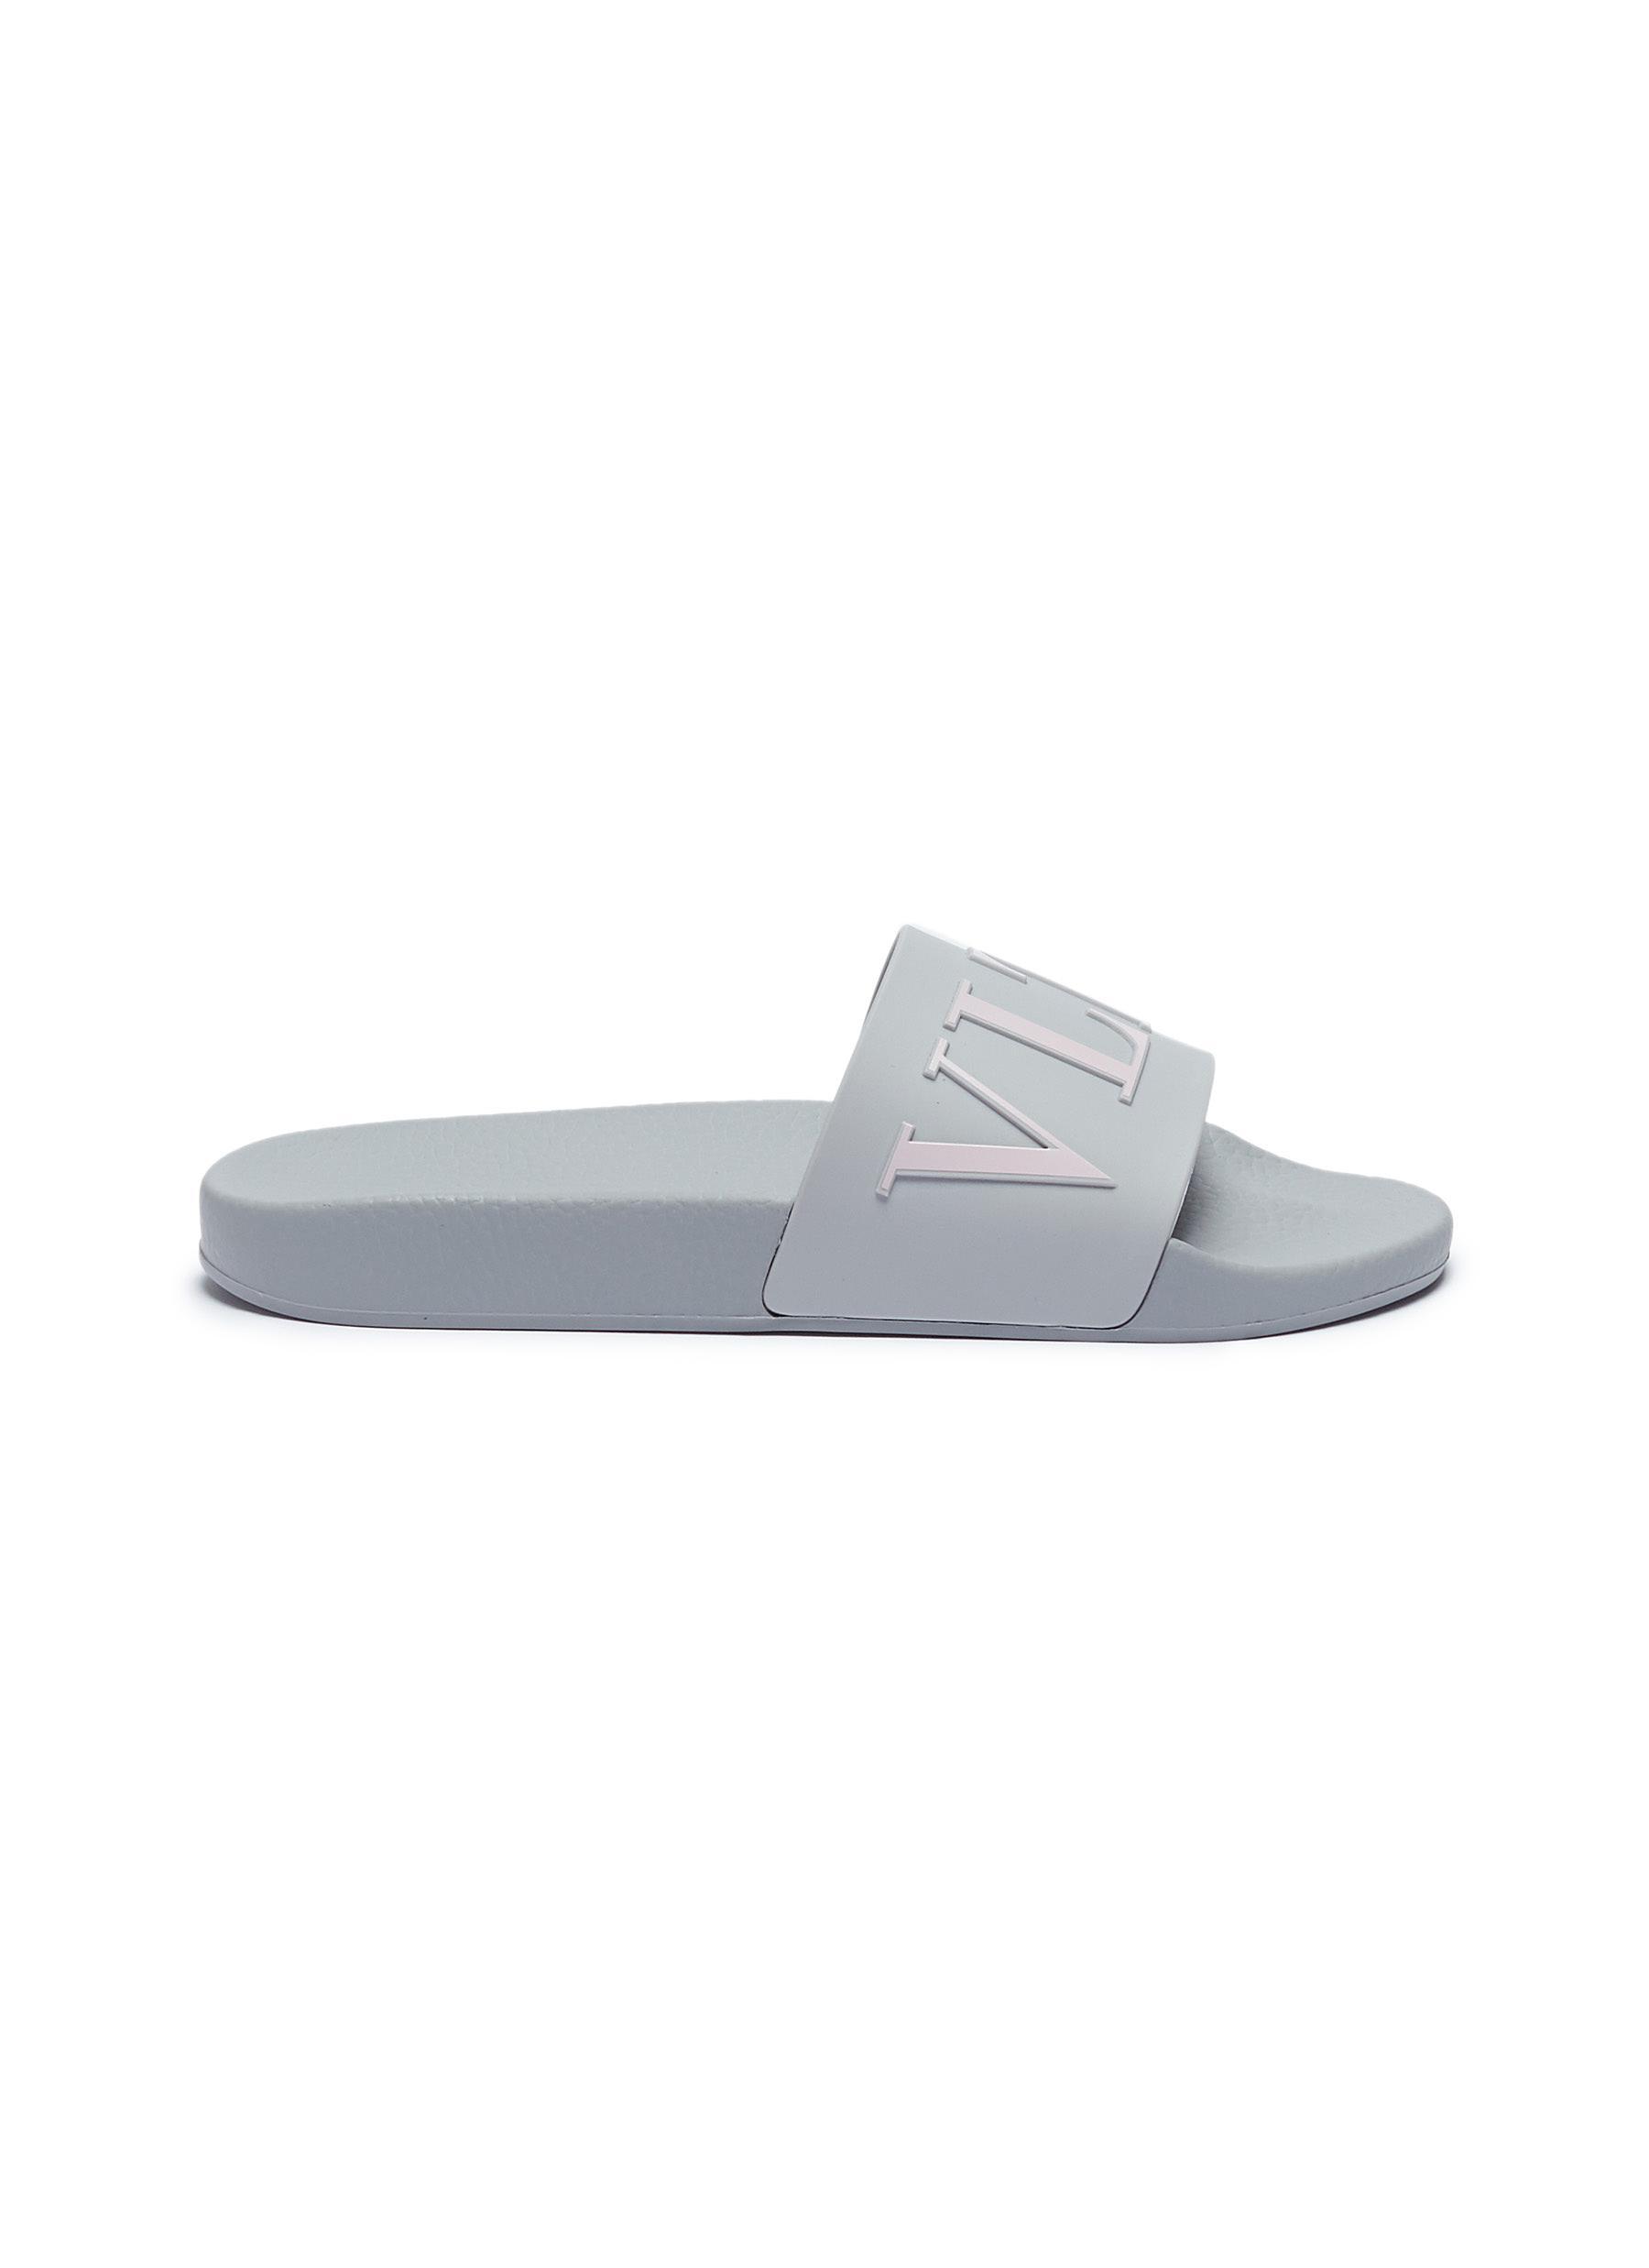 Logo print slide sandals by Valentino